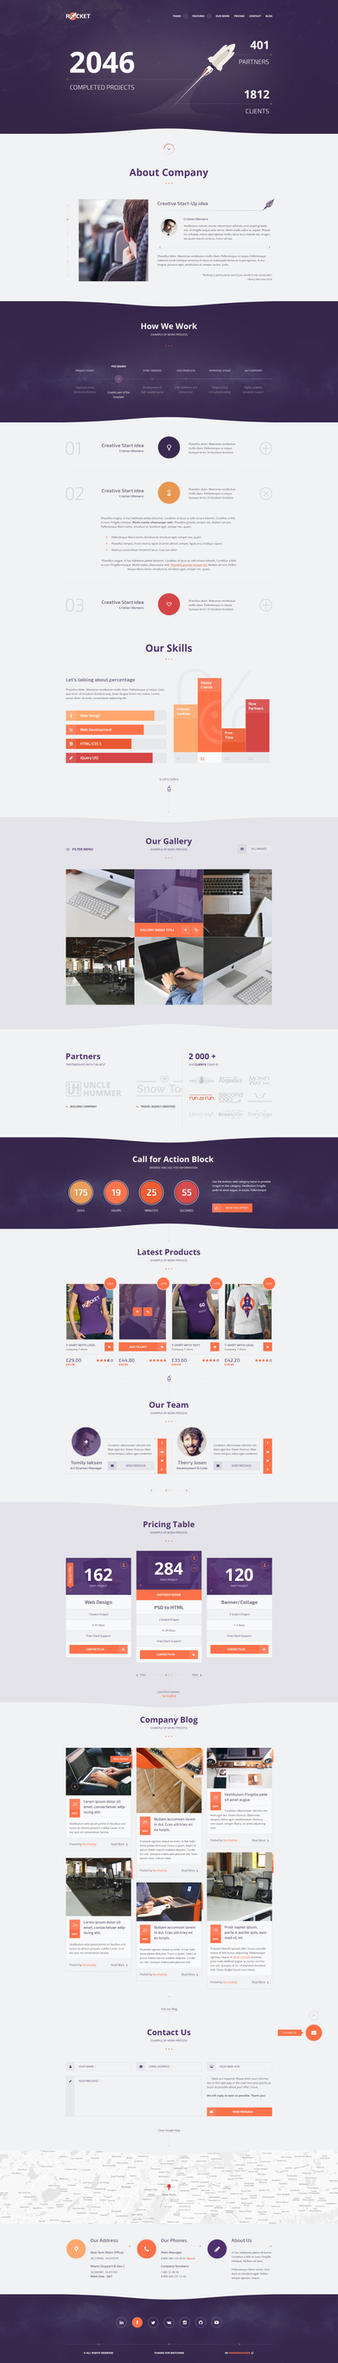 Rocket - Creative Multipurpose Template by webdesigngeek